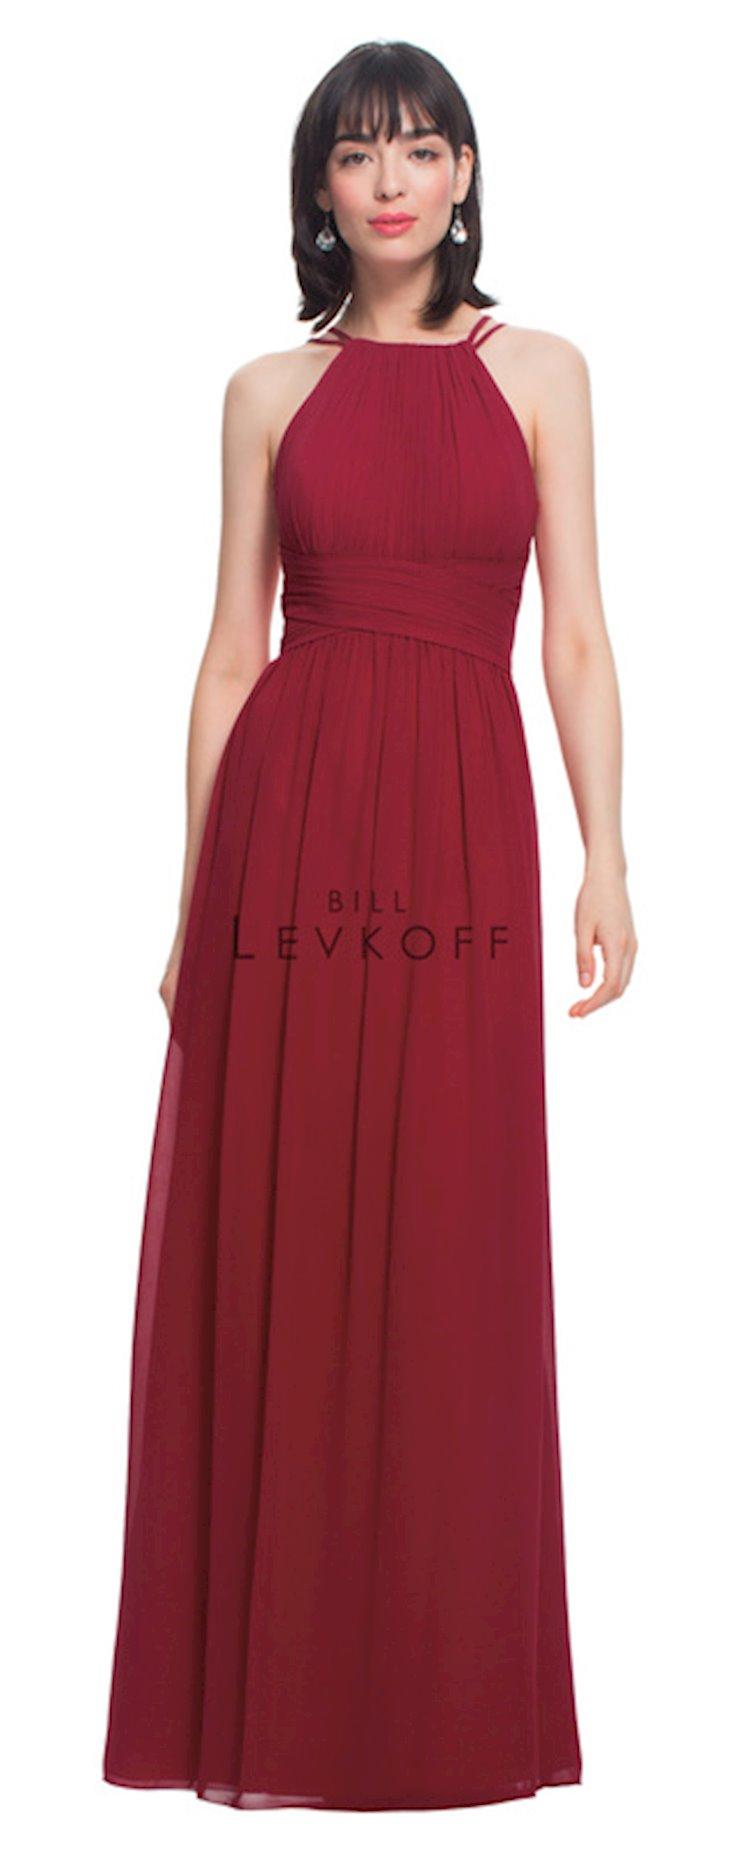 Bill Levkoff Style #1456